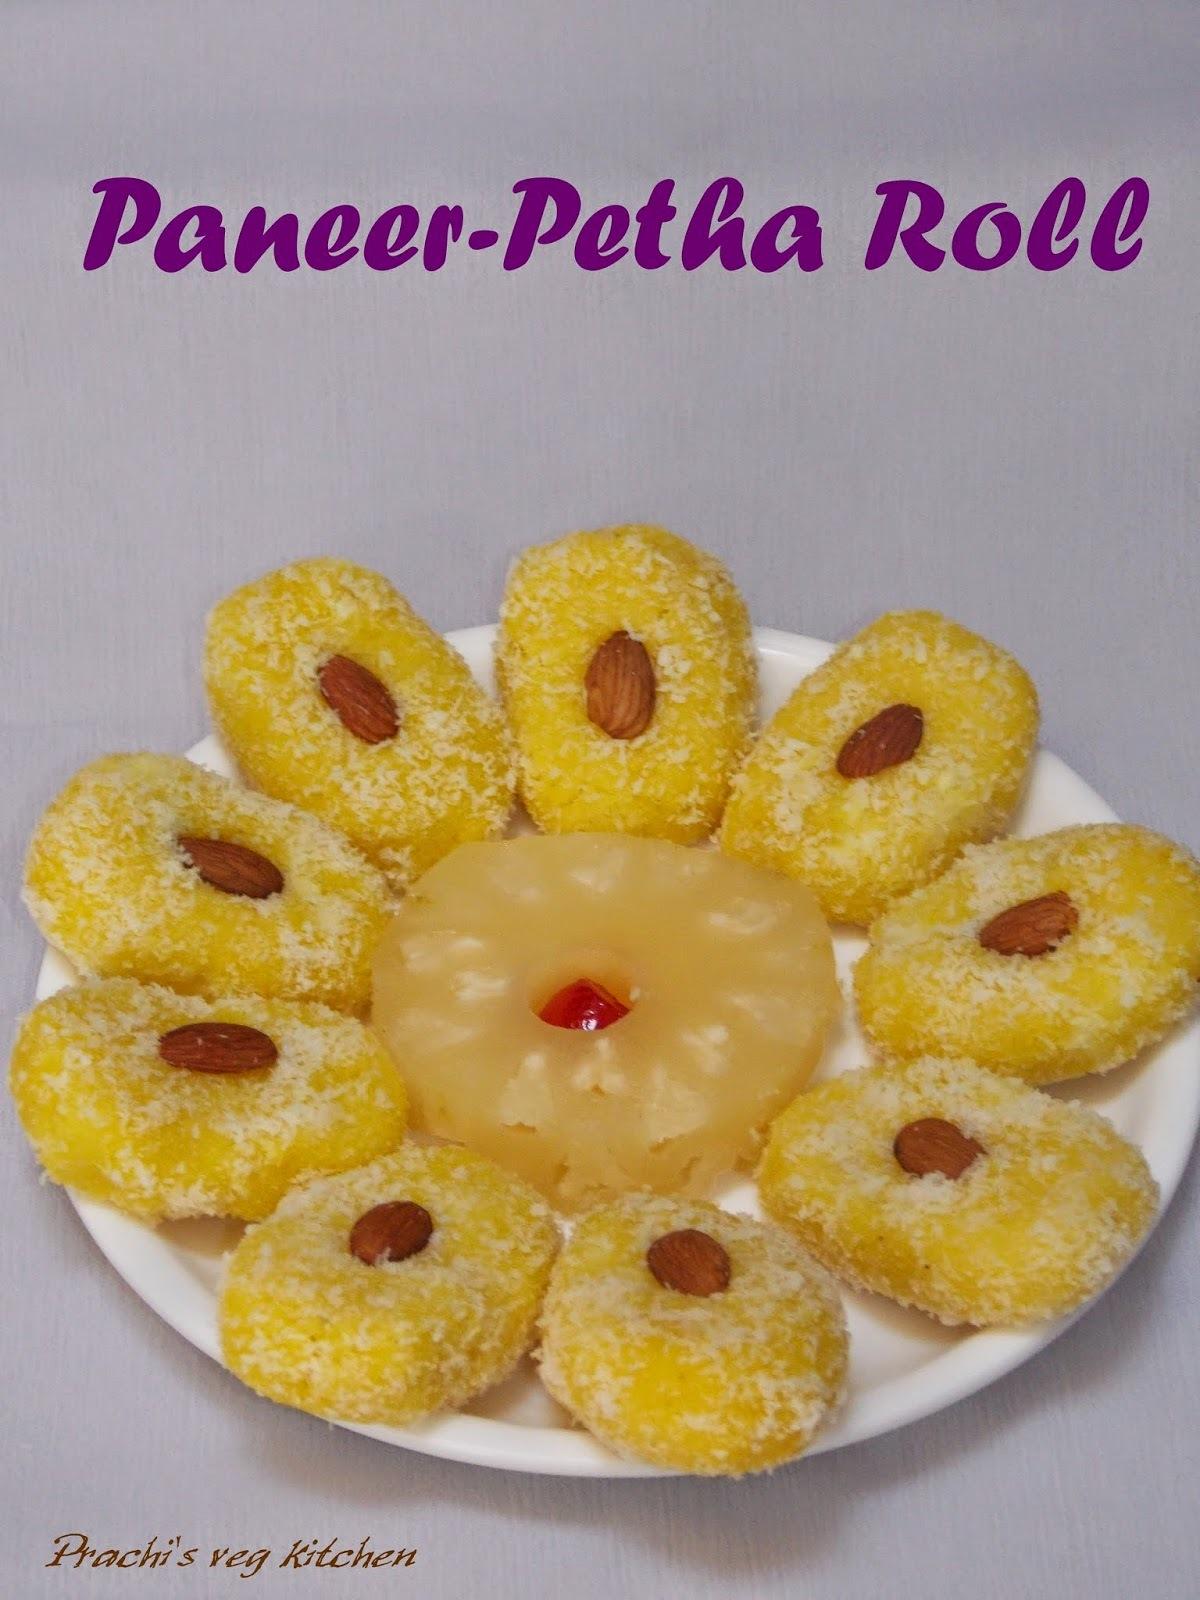 Paneer-Petha Roll